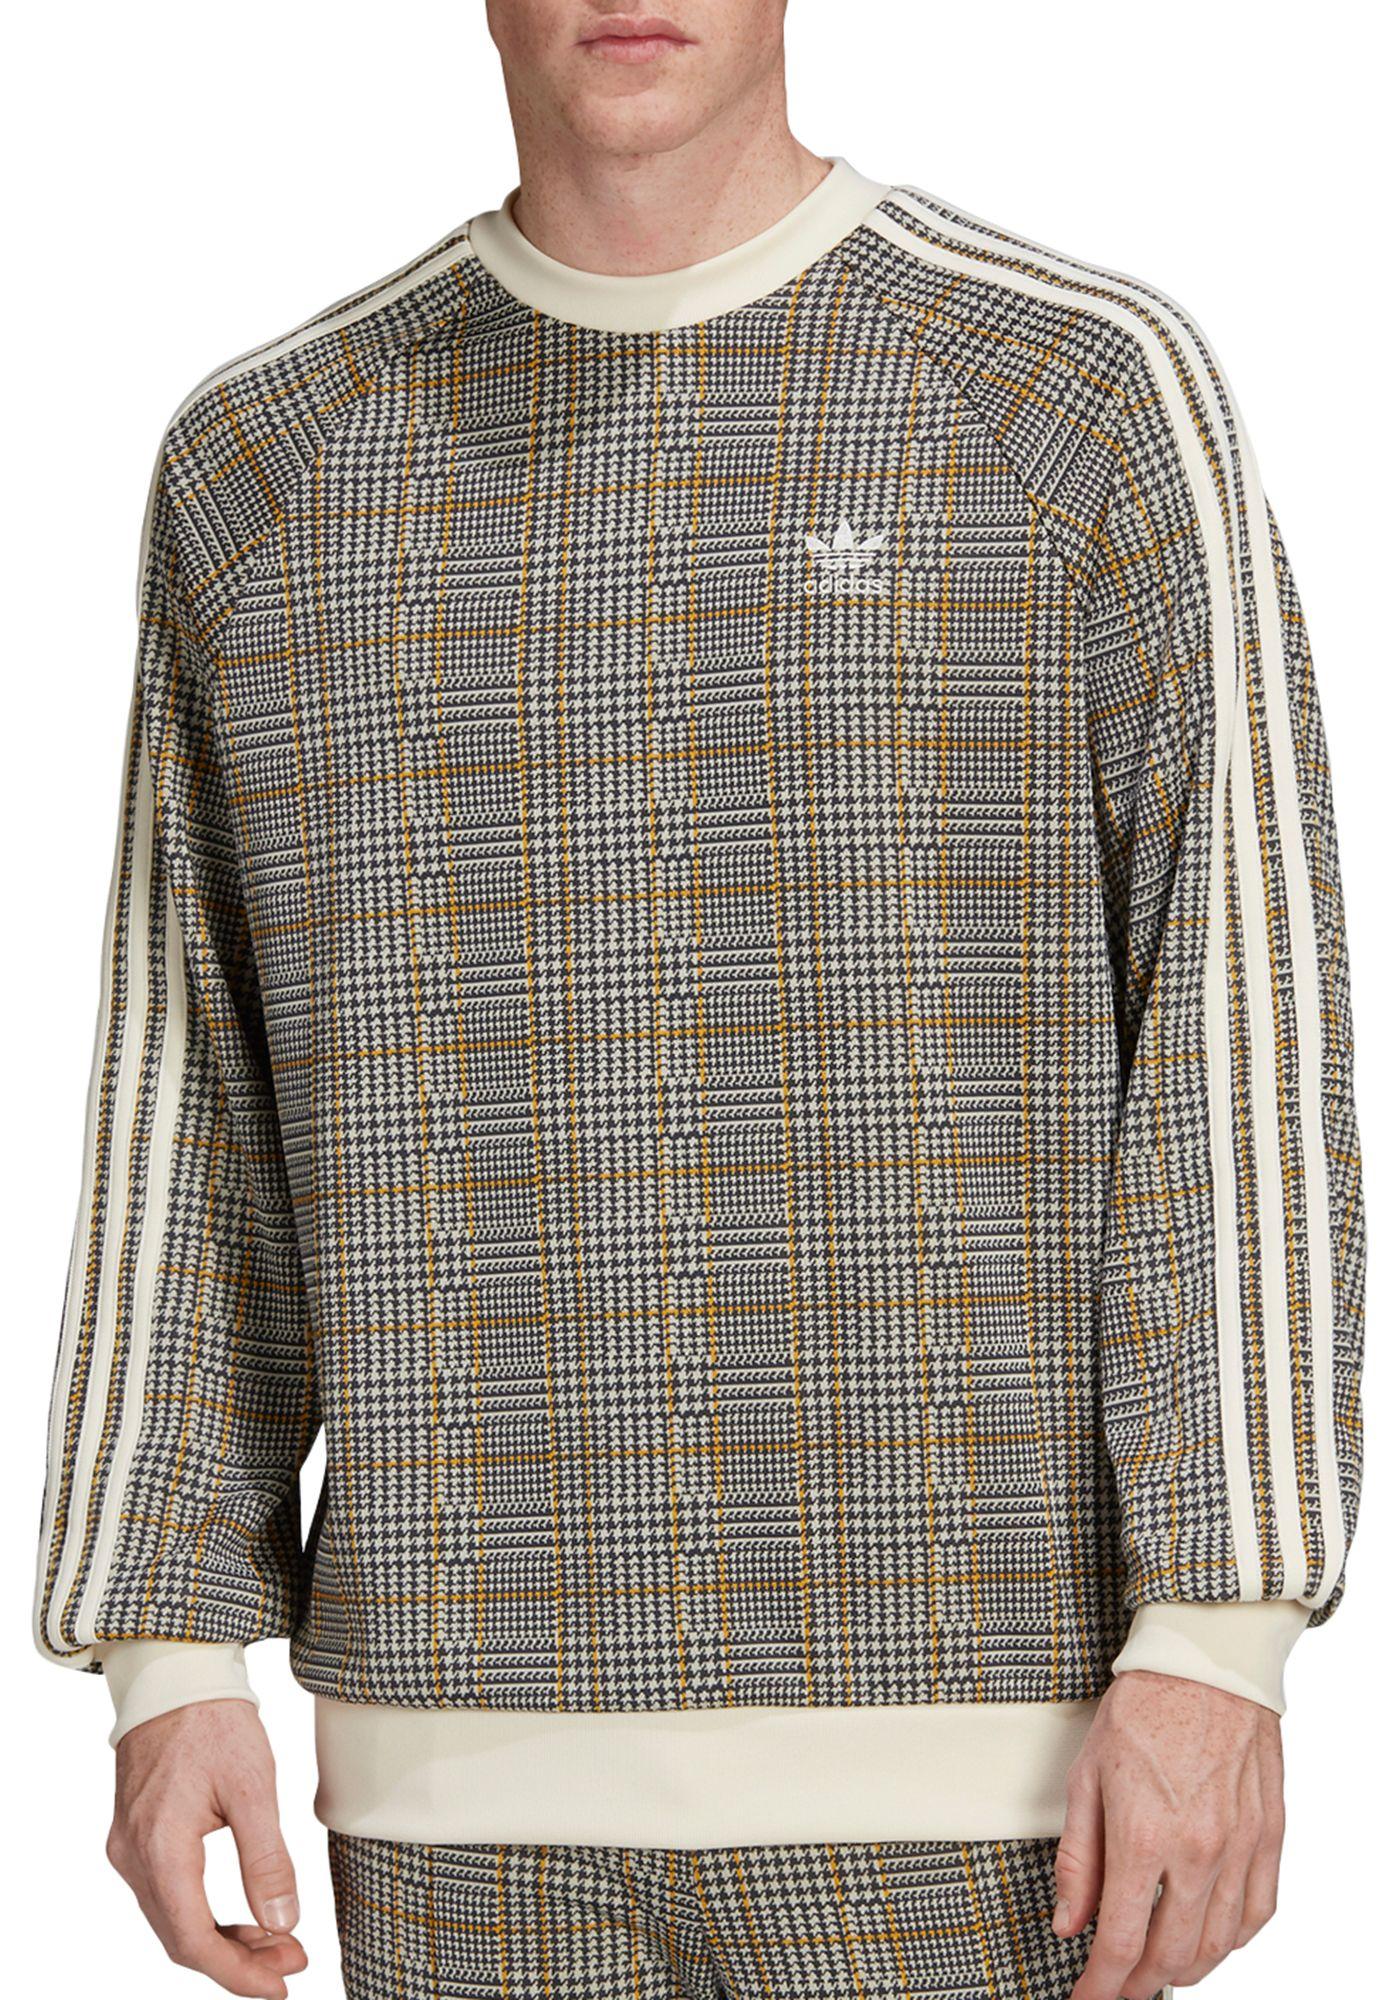 adidas Originals Men's Tartan Crewneck Sweatshirt